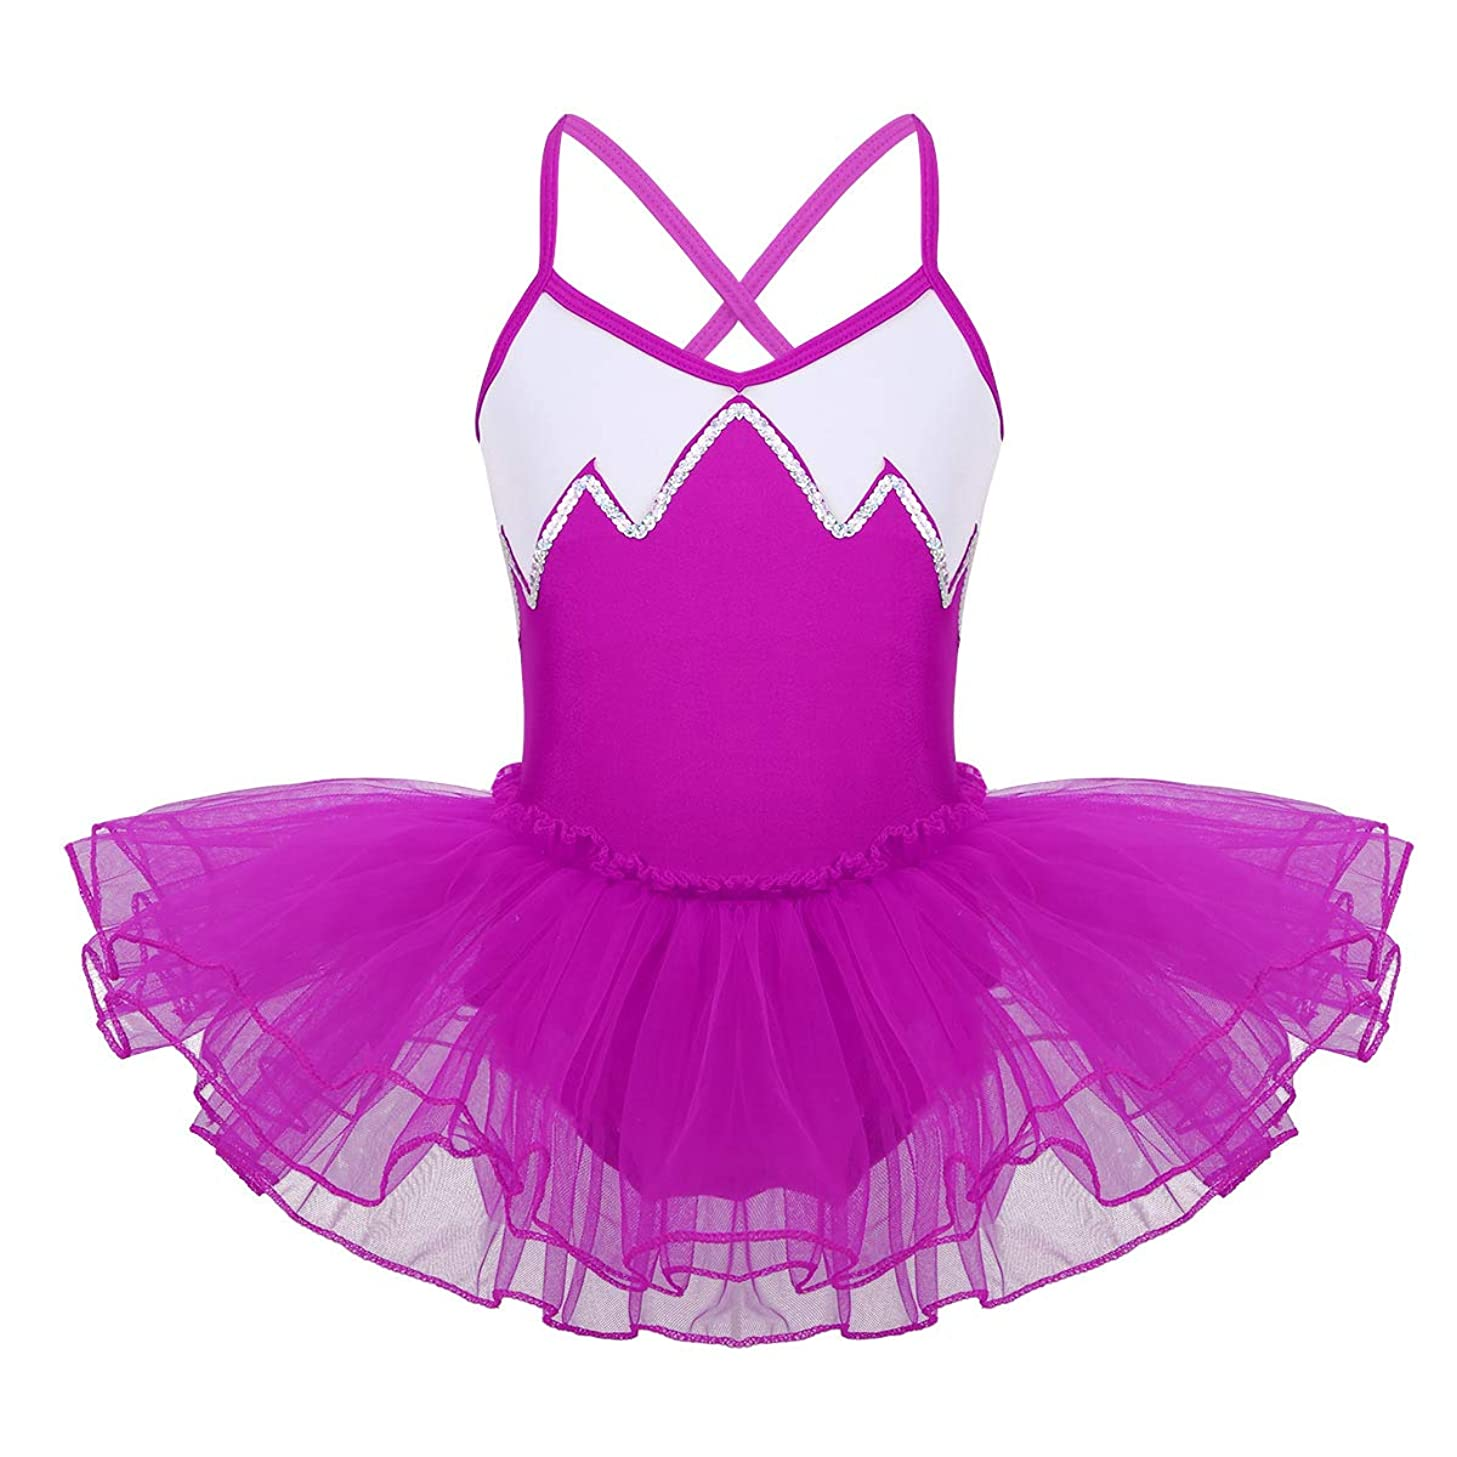 iiniim Girls Gymnastic Camisole Leotard Ballet Tutu Skirt Dress Ballerina Dance wear Costumes